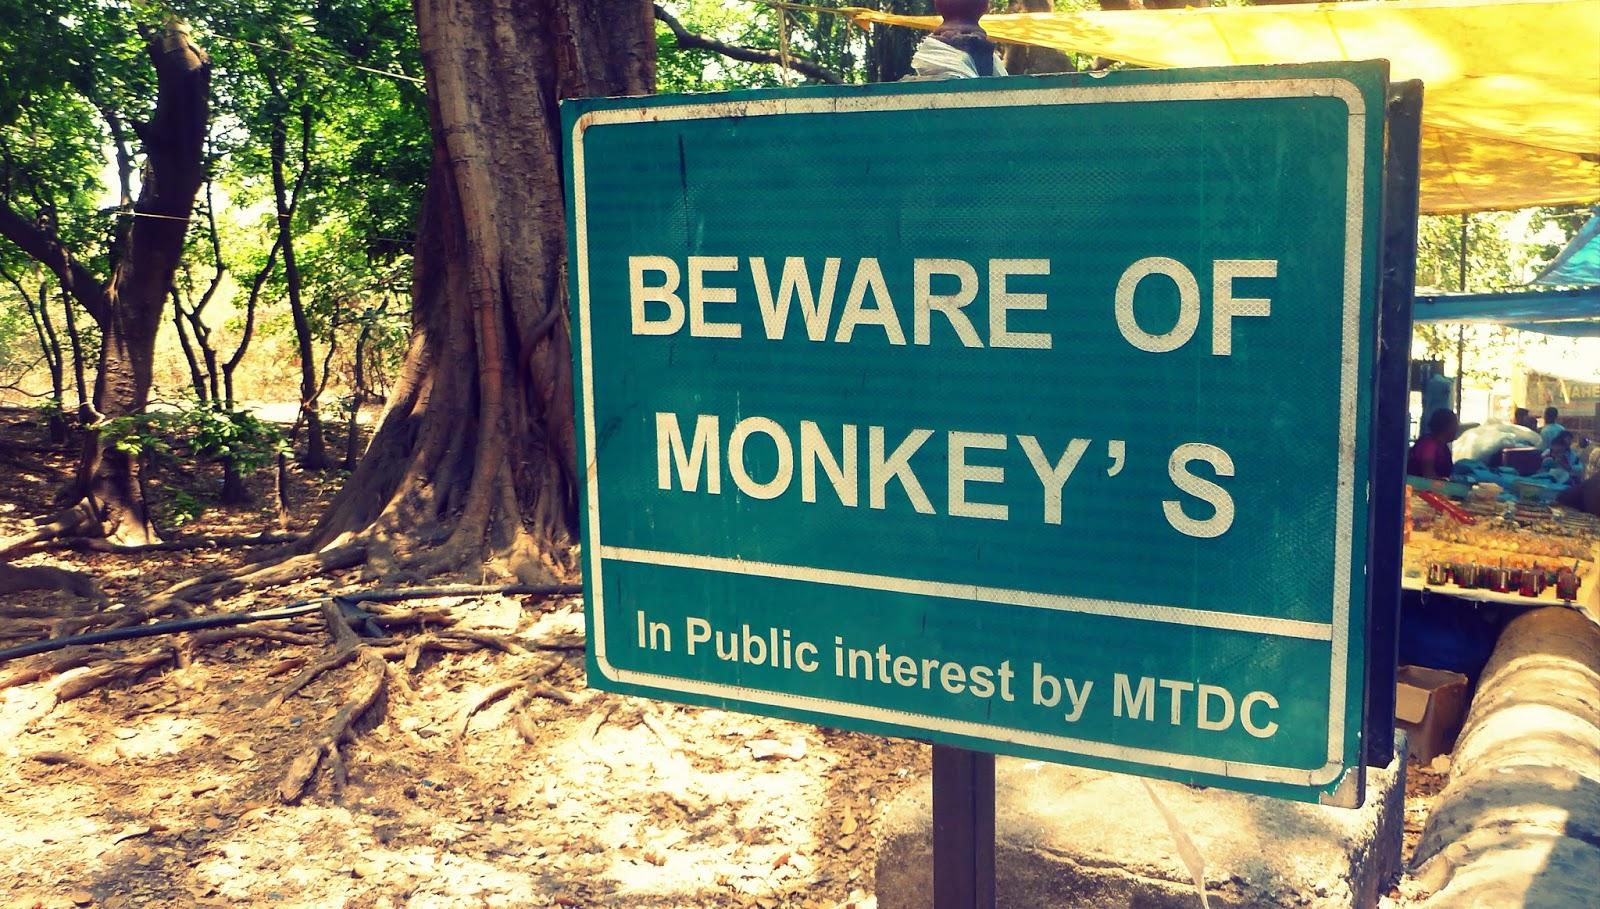 Beware of monkeys